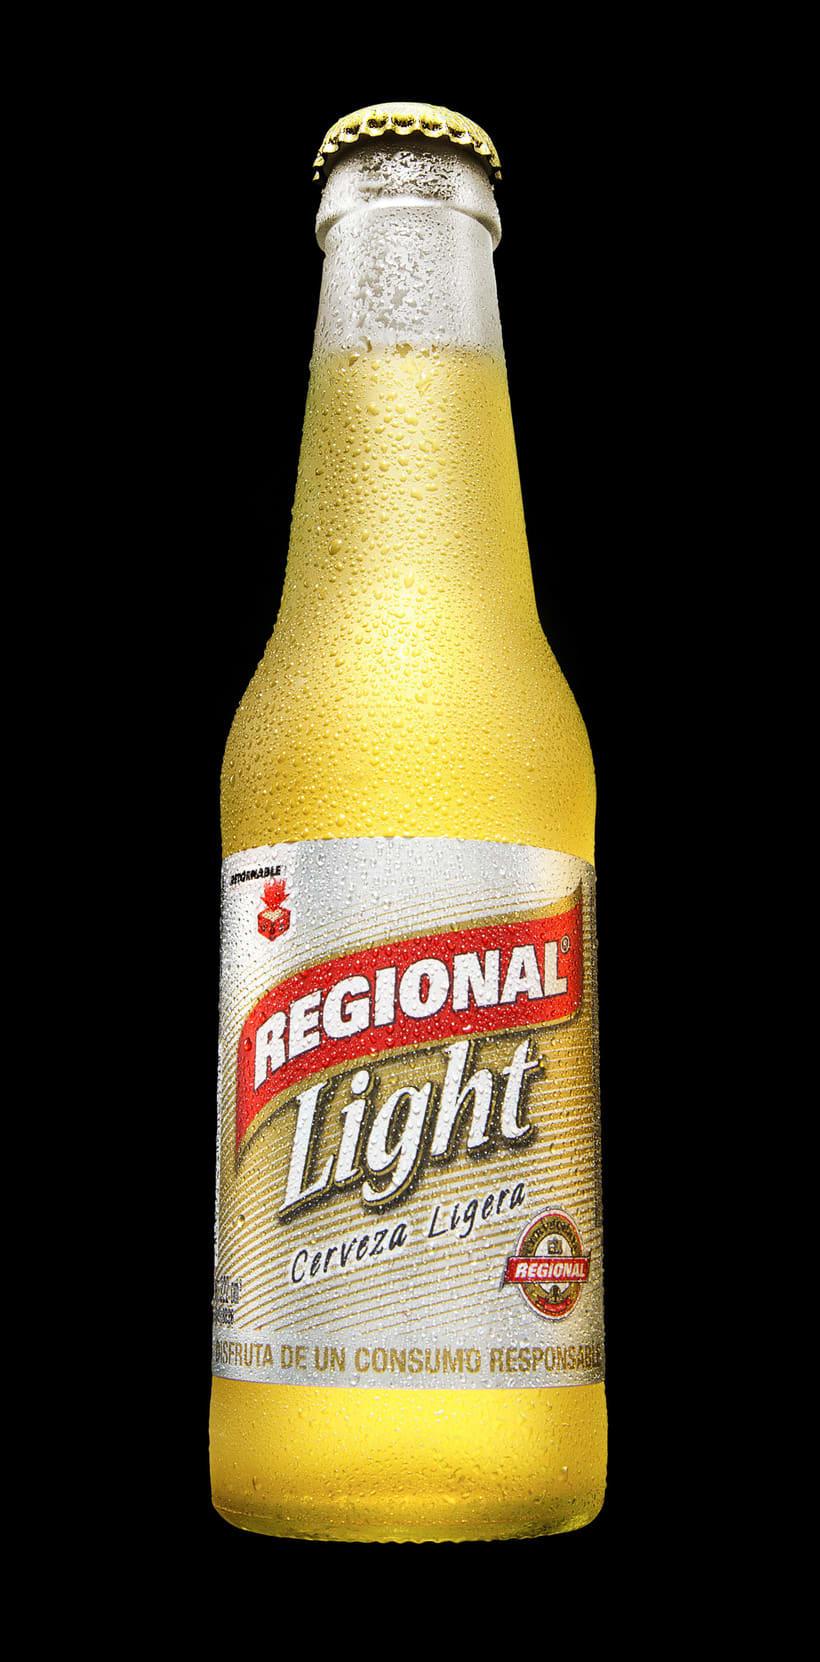 Retoque Digital Regional Light 1